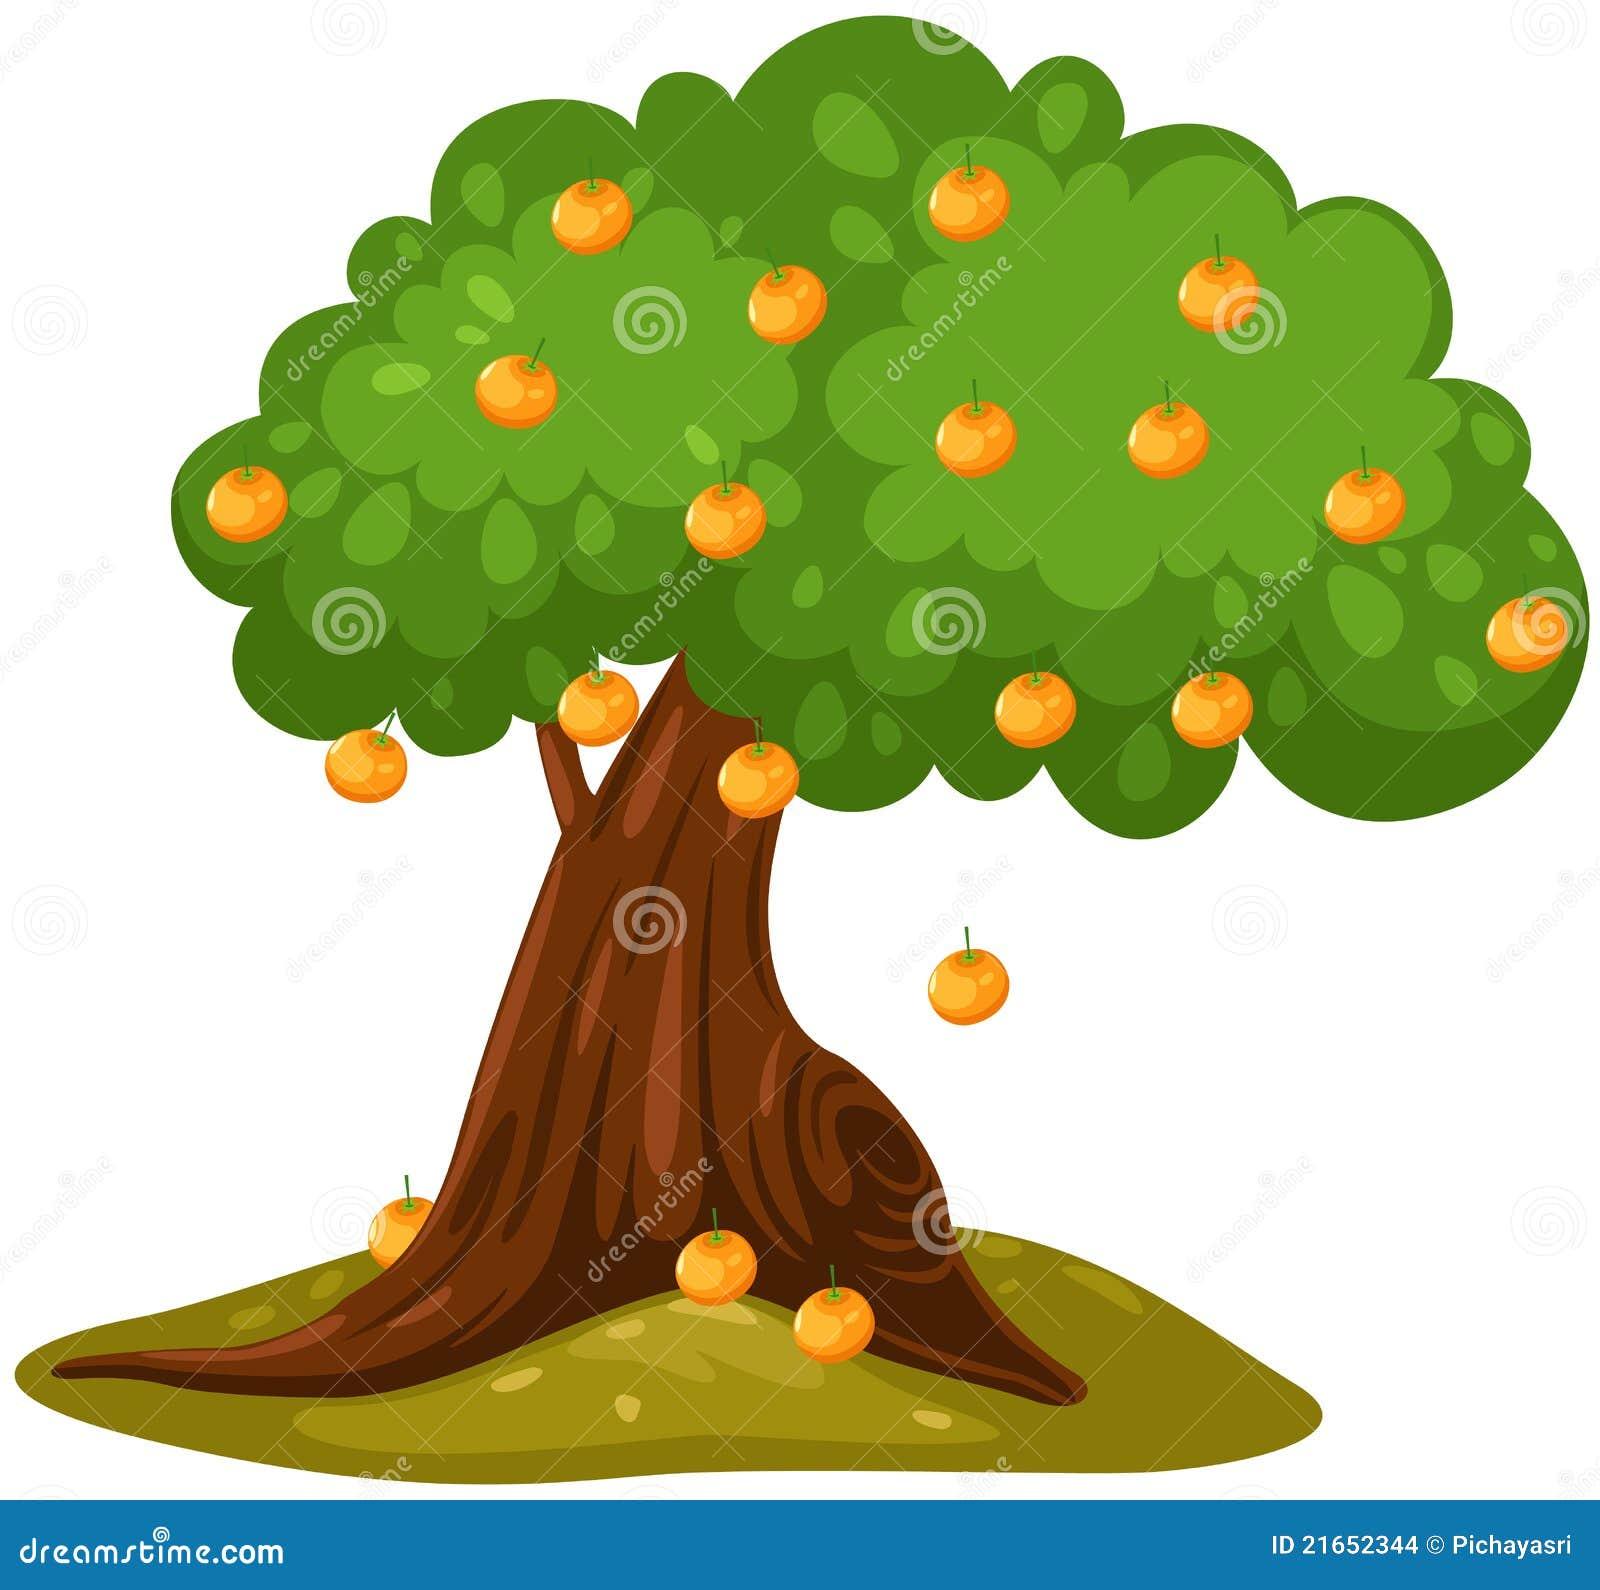 Orange tree stock vector. Illustration of fruit, forest ...